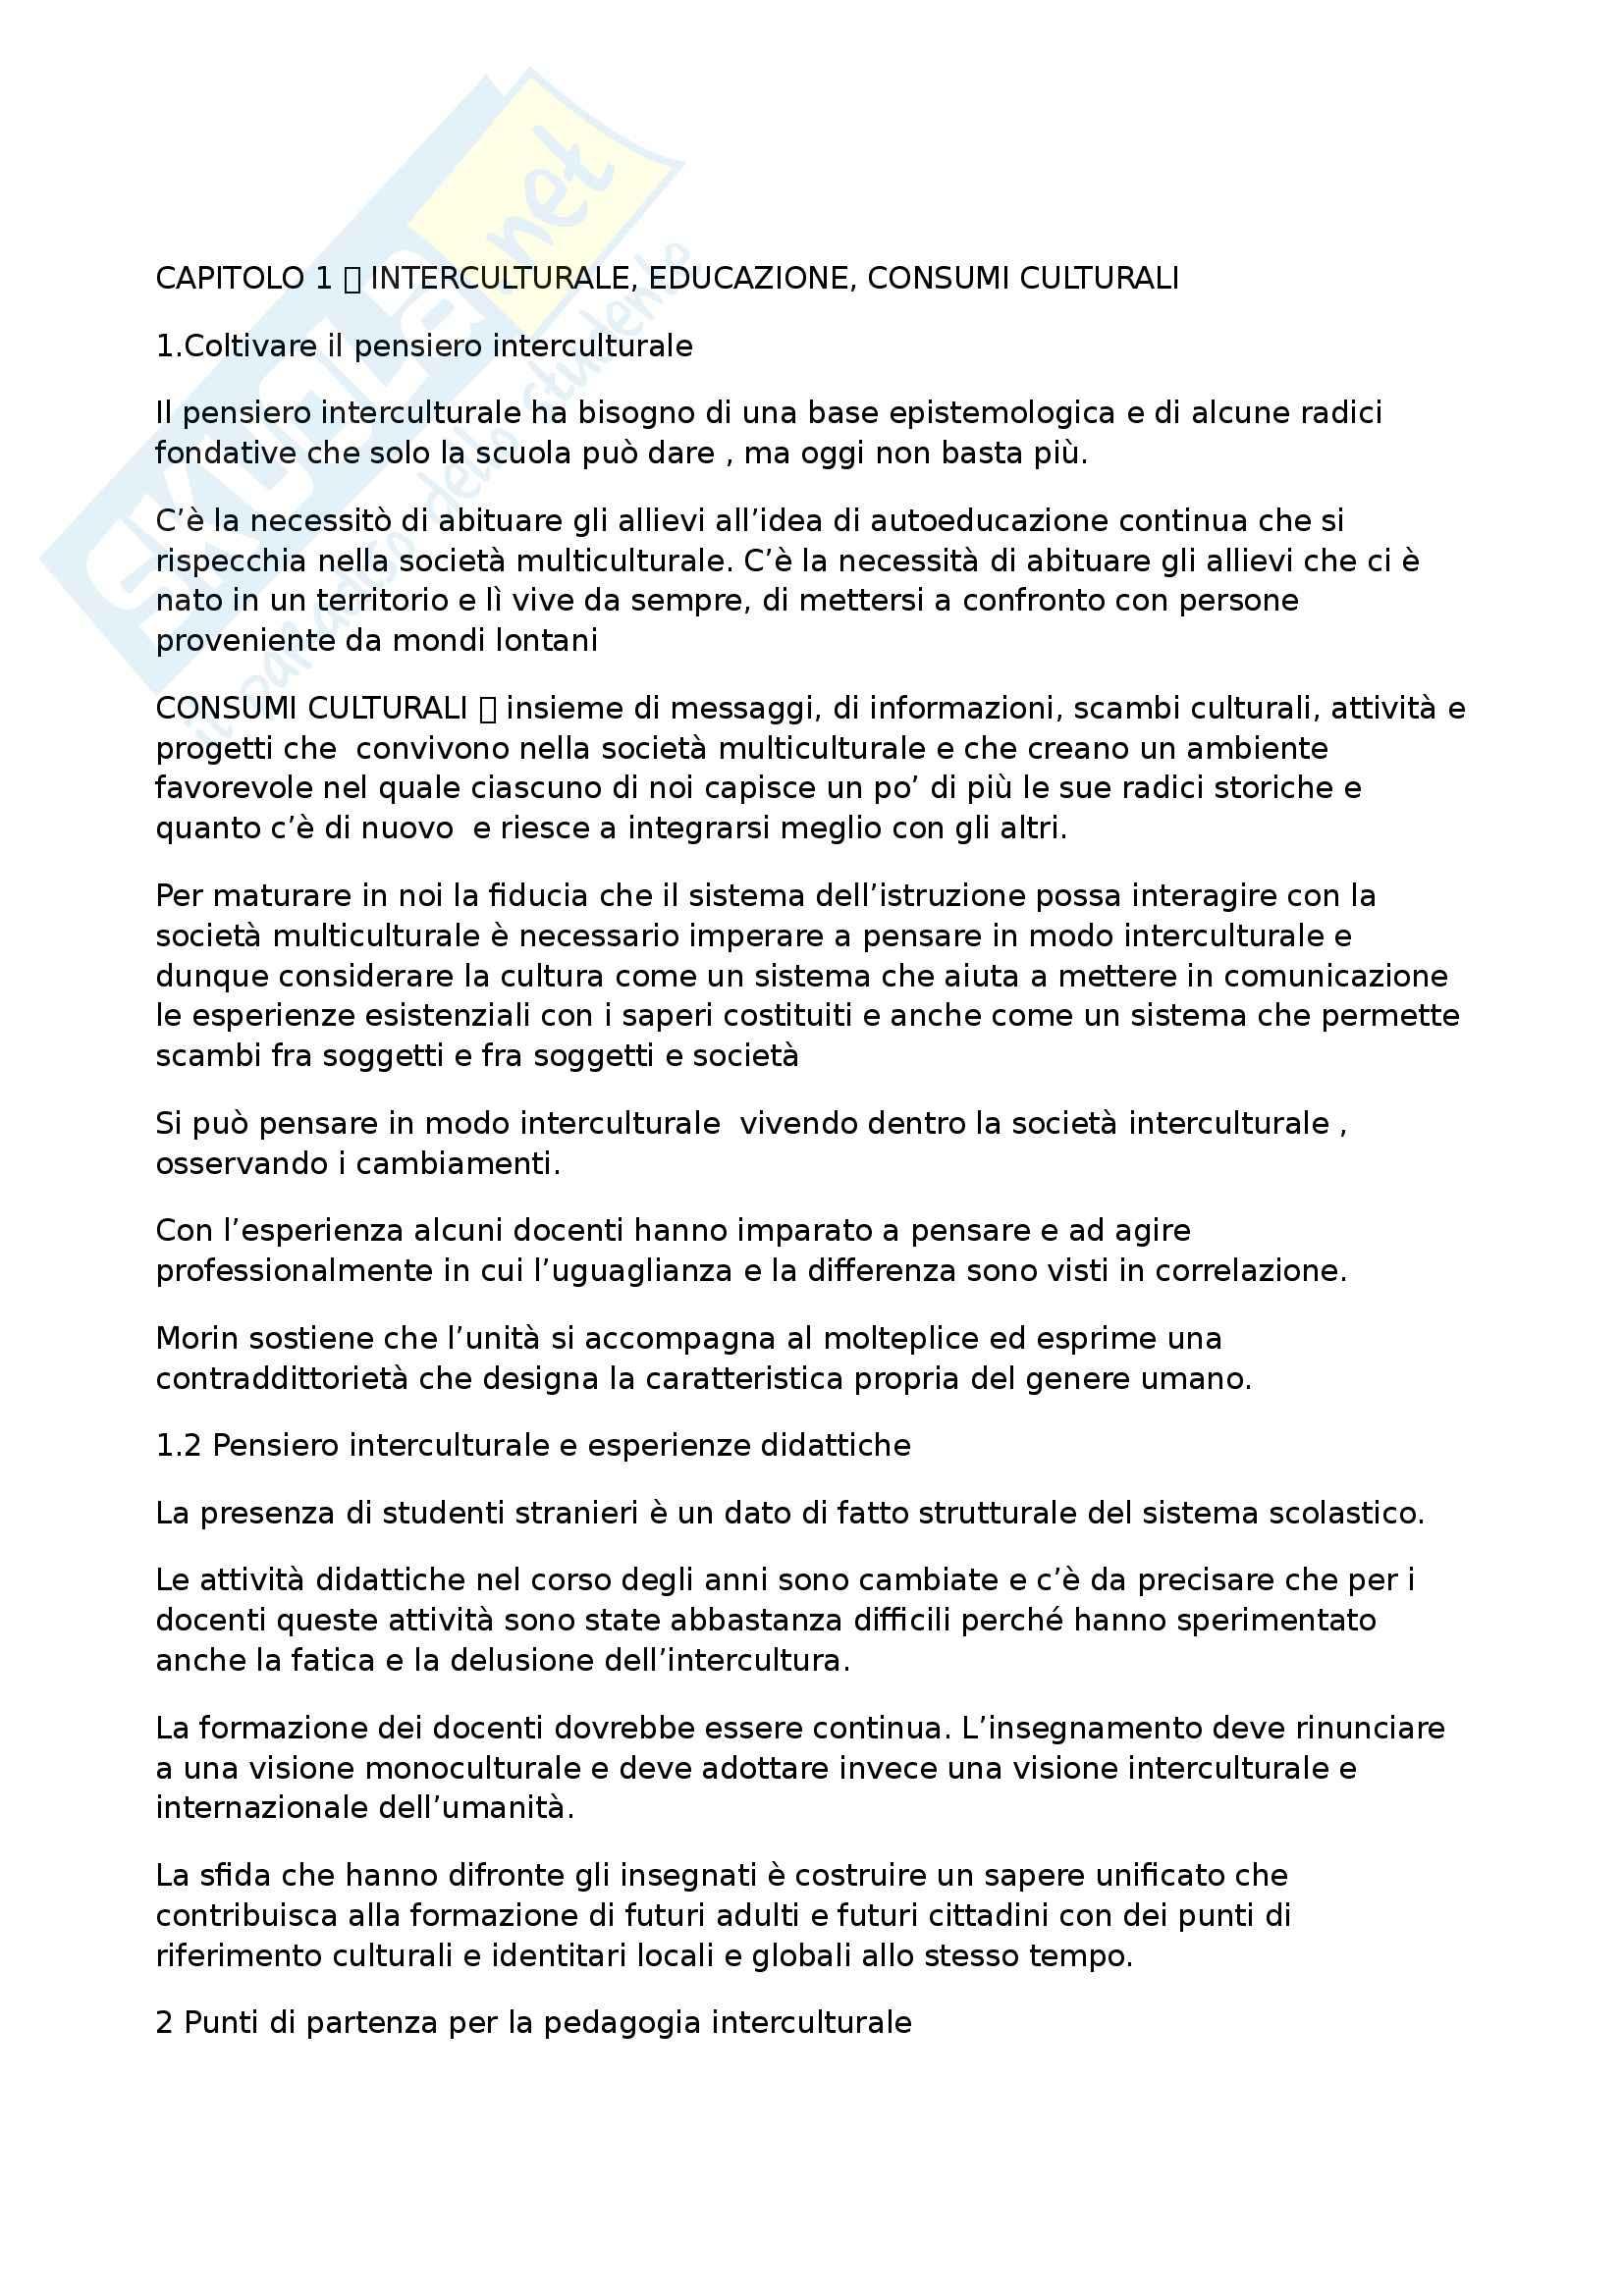 appunto M. Giusti Pedagogia interculturale